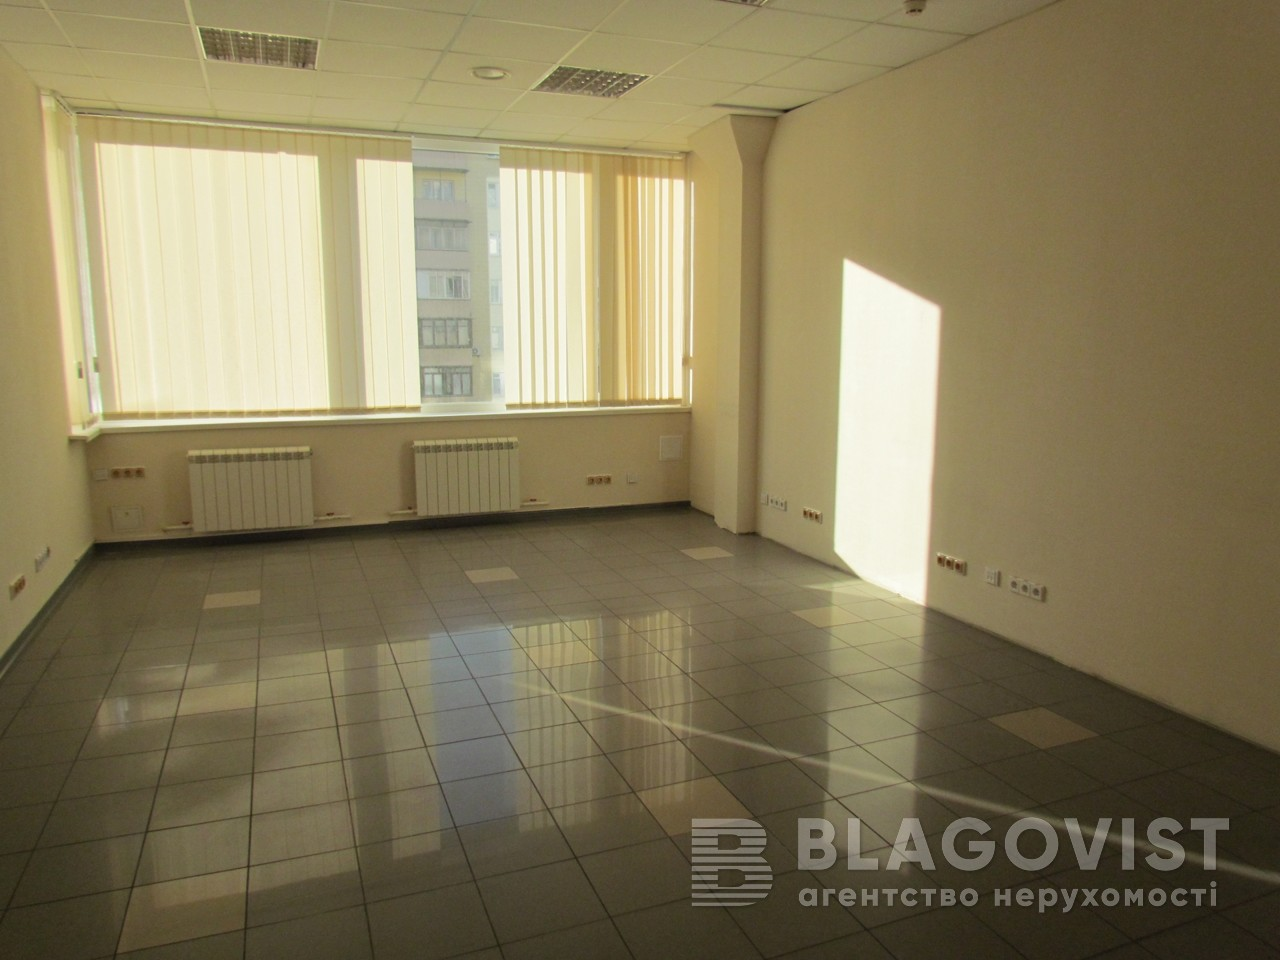 Офис, H-41464, Леси Украинки бульв., Киев - Фото 6